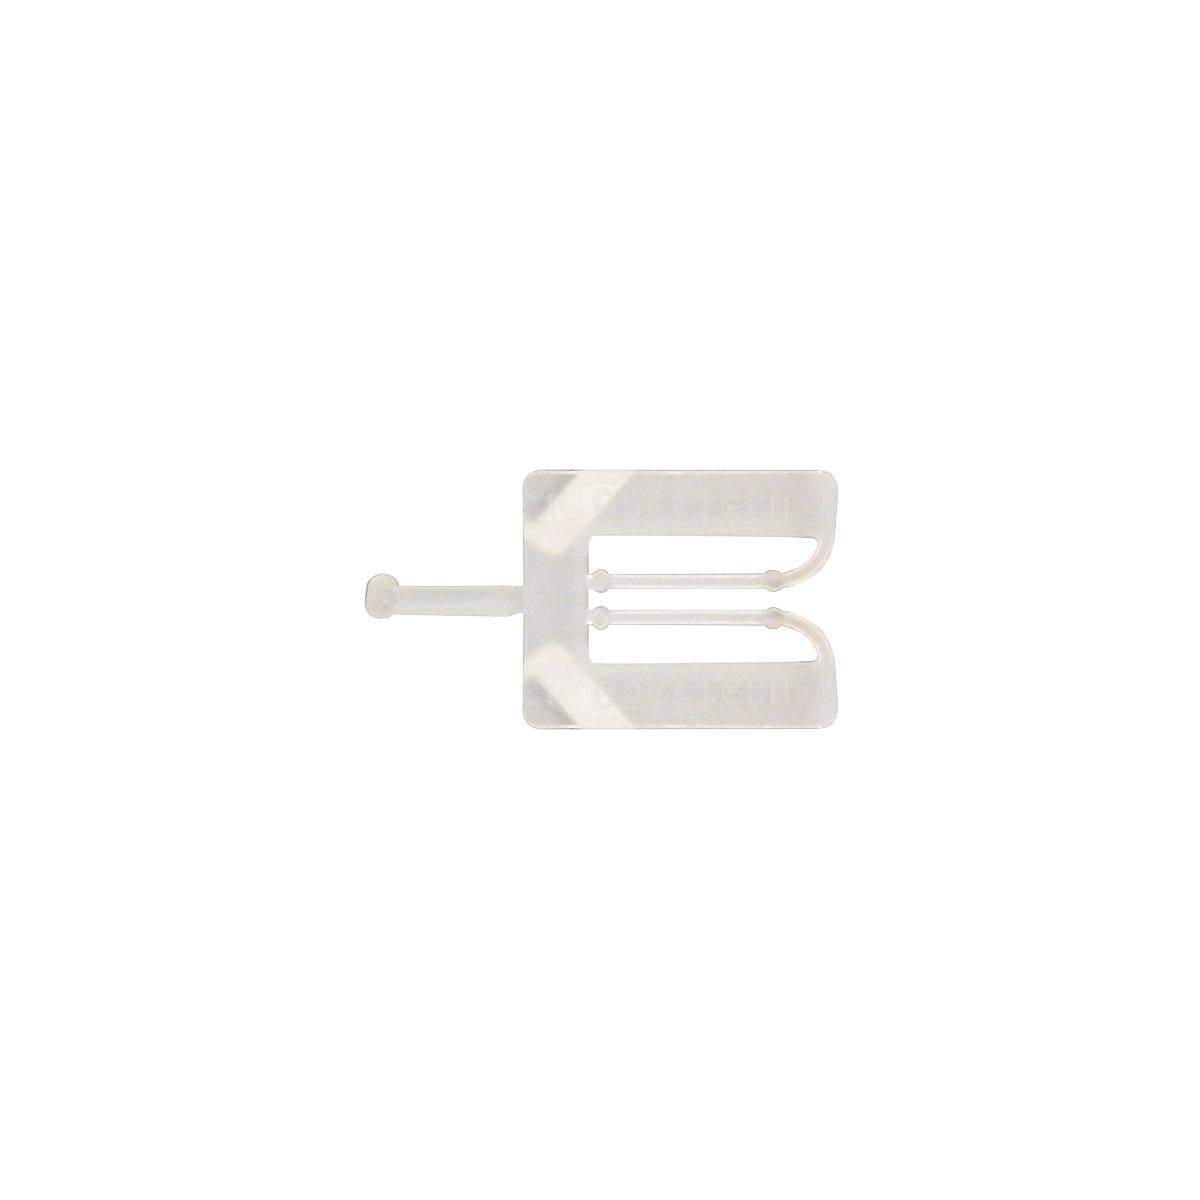 SACHET 1000 CALES KLIC-CLAC 1 MM